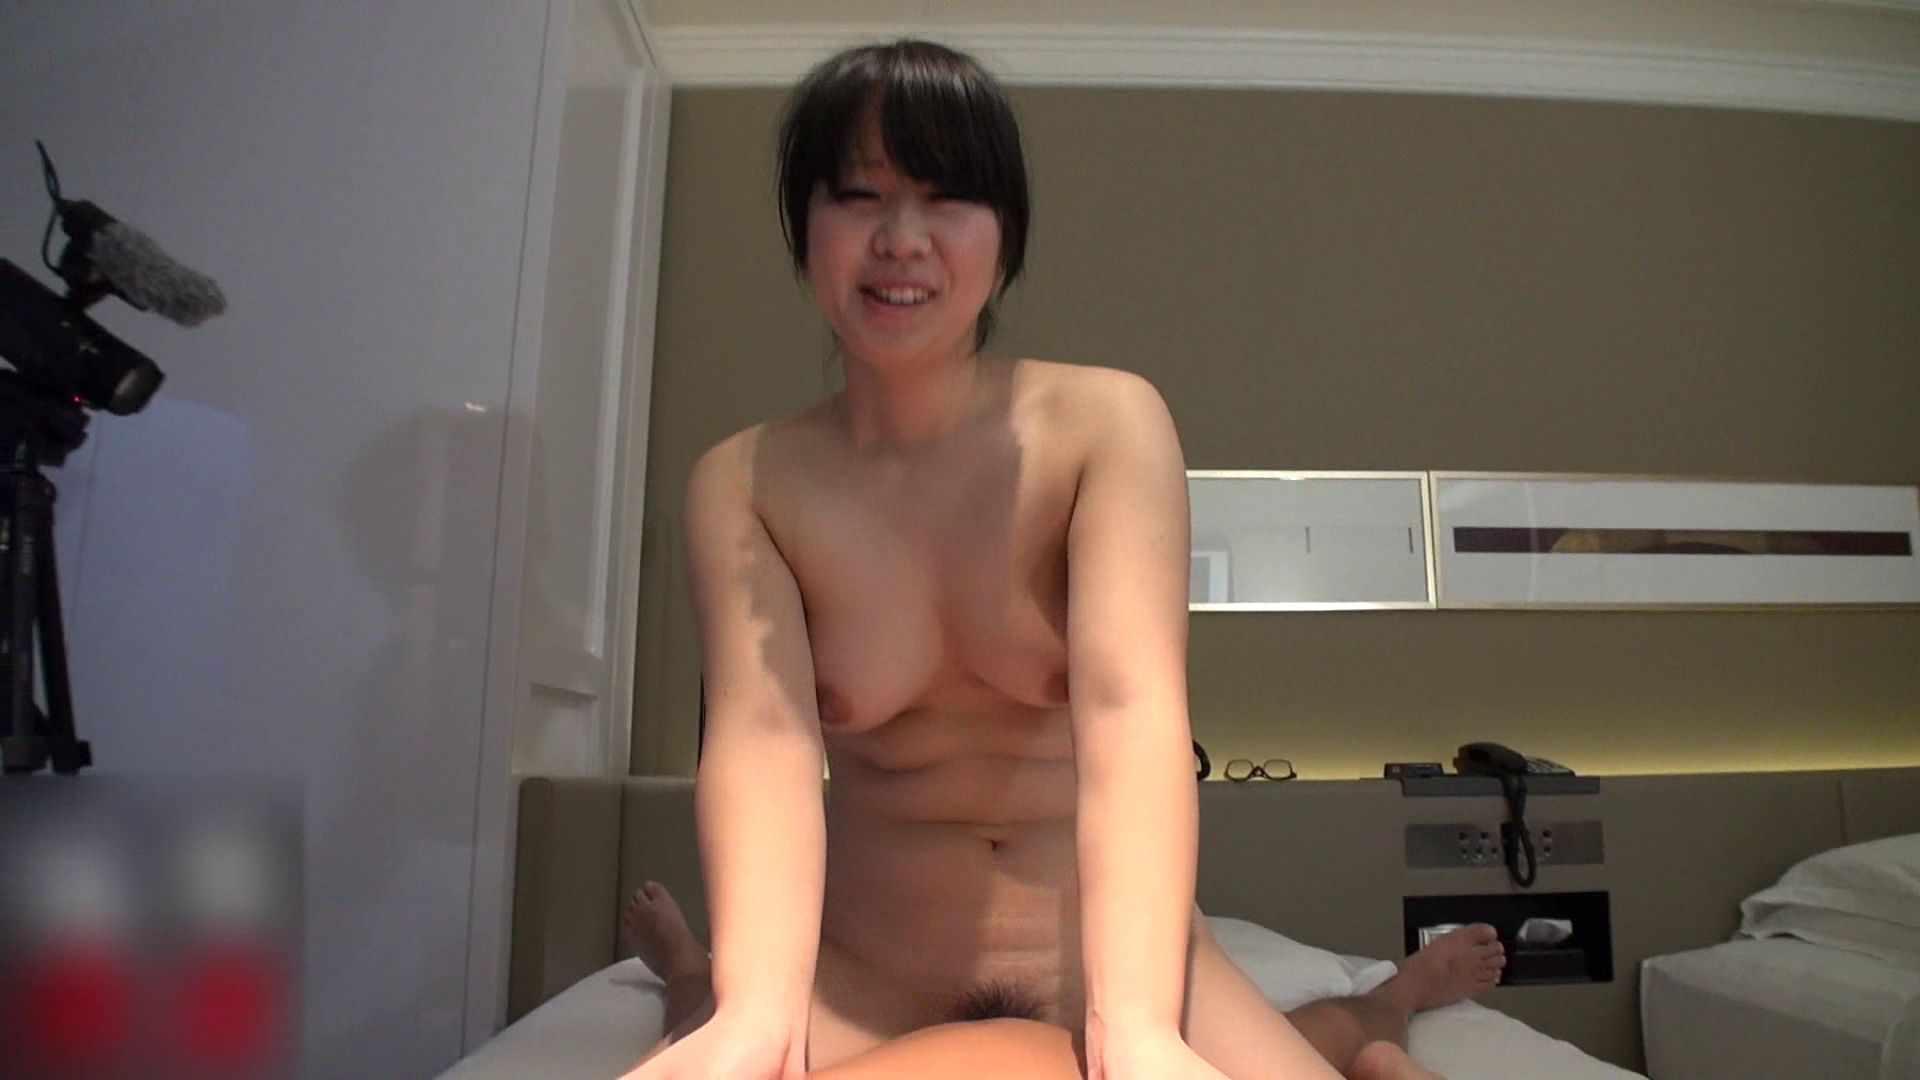 S級厳選美女ビッチガールVol.39 後編 セックス  70枚 51